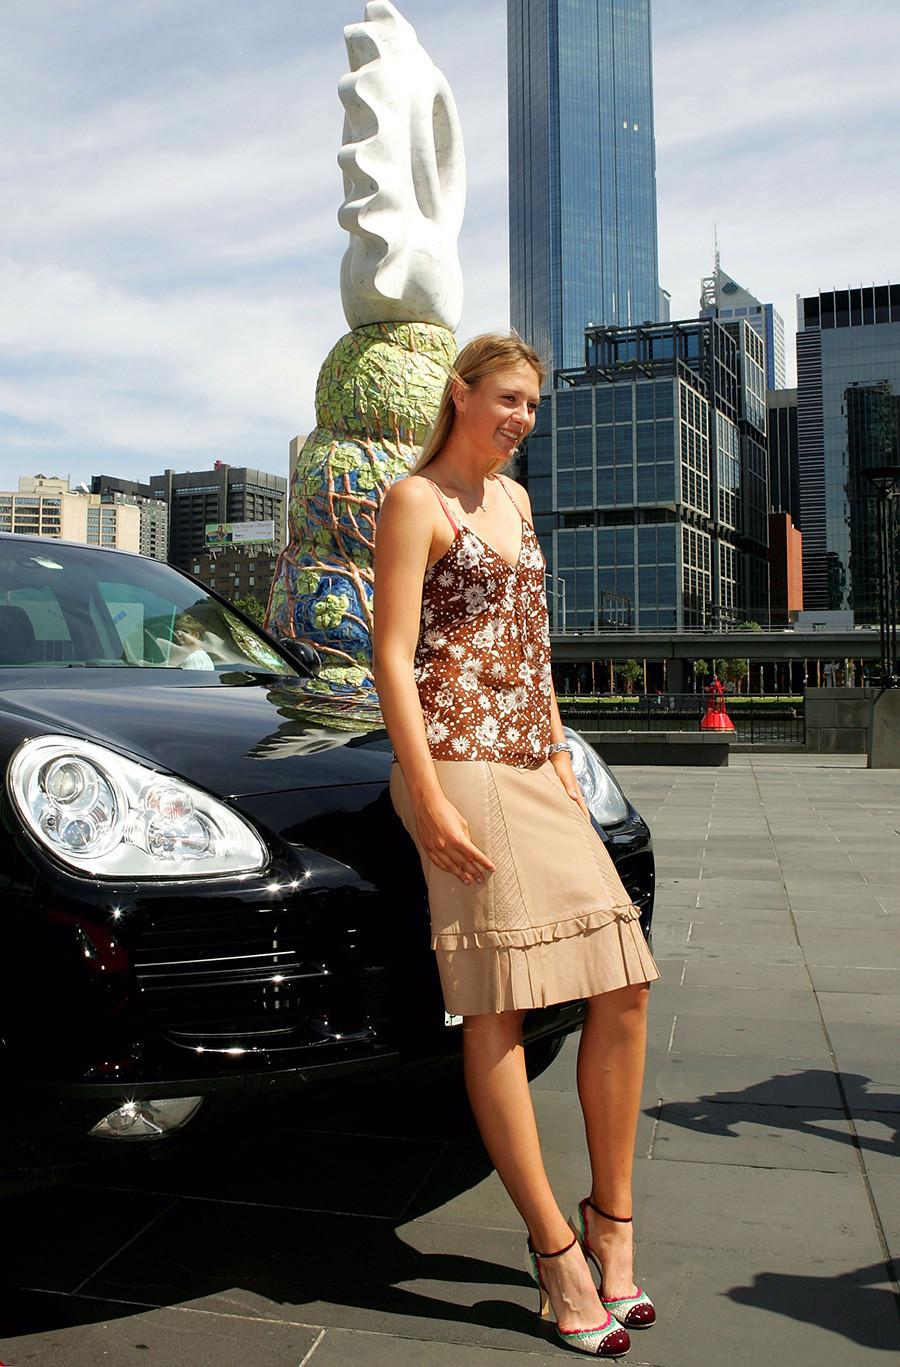 Maria Sharapova berpose seusai menyumbangkan uang senilai Porsche yang dimenangkannya pada Kejuaraan Tur WTA 2004 untuk amal selama berlangsungnya turnamen Australia Terbuka di Melbourne Park.